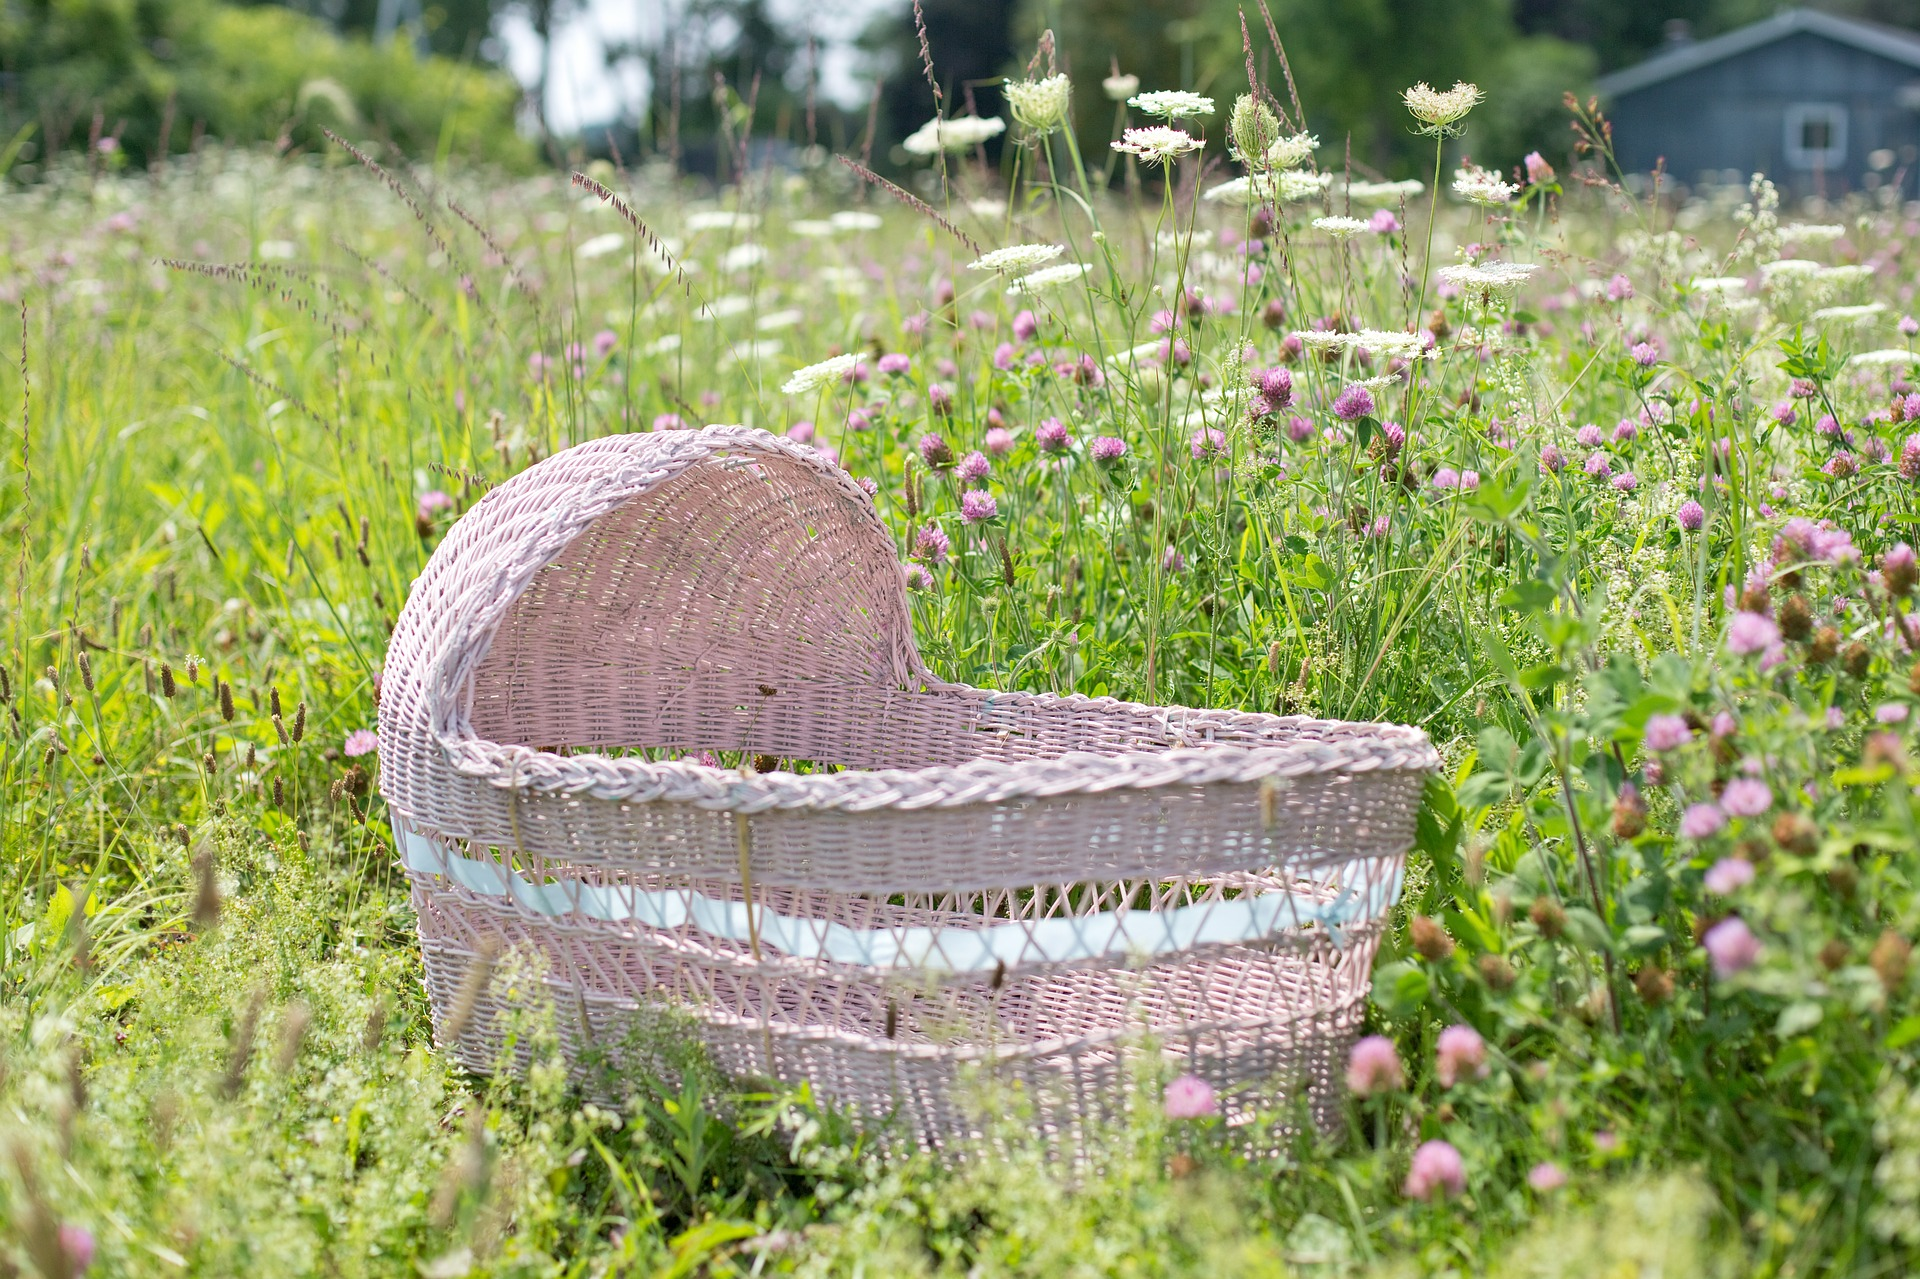 Baby Bassinet, Garden, Object, Wild, Wooden, HQ Photo